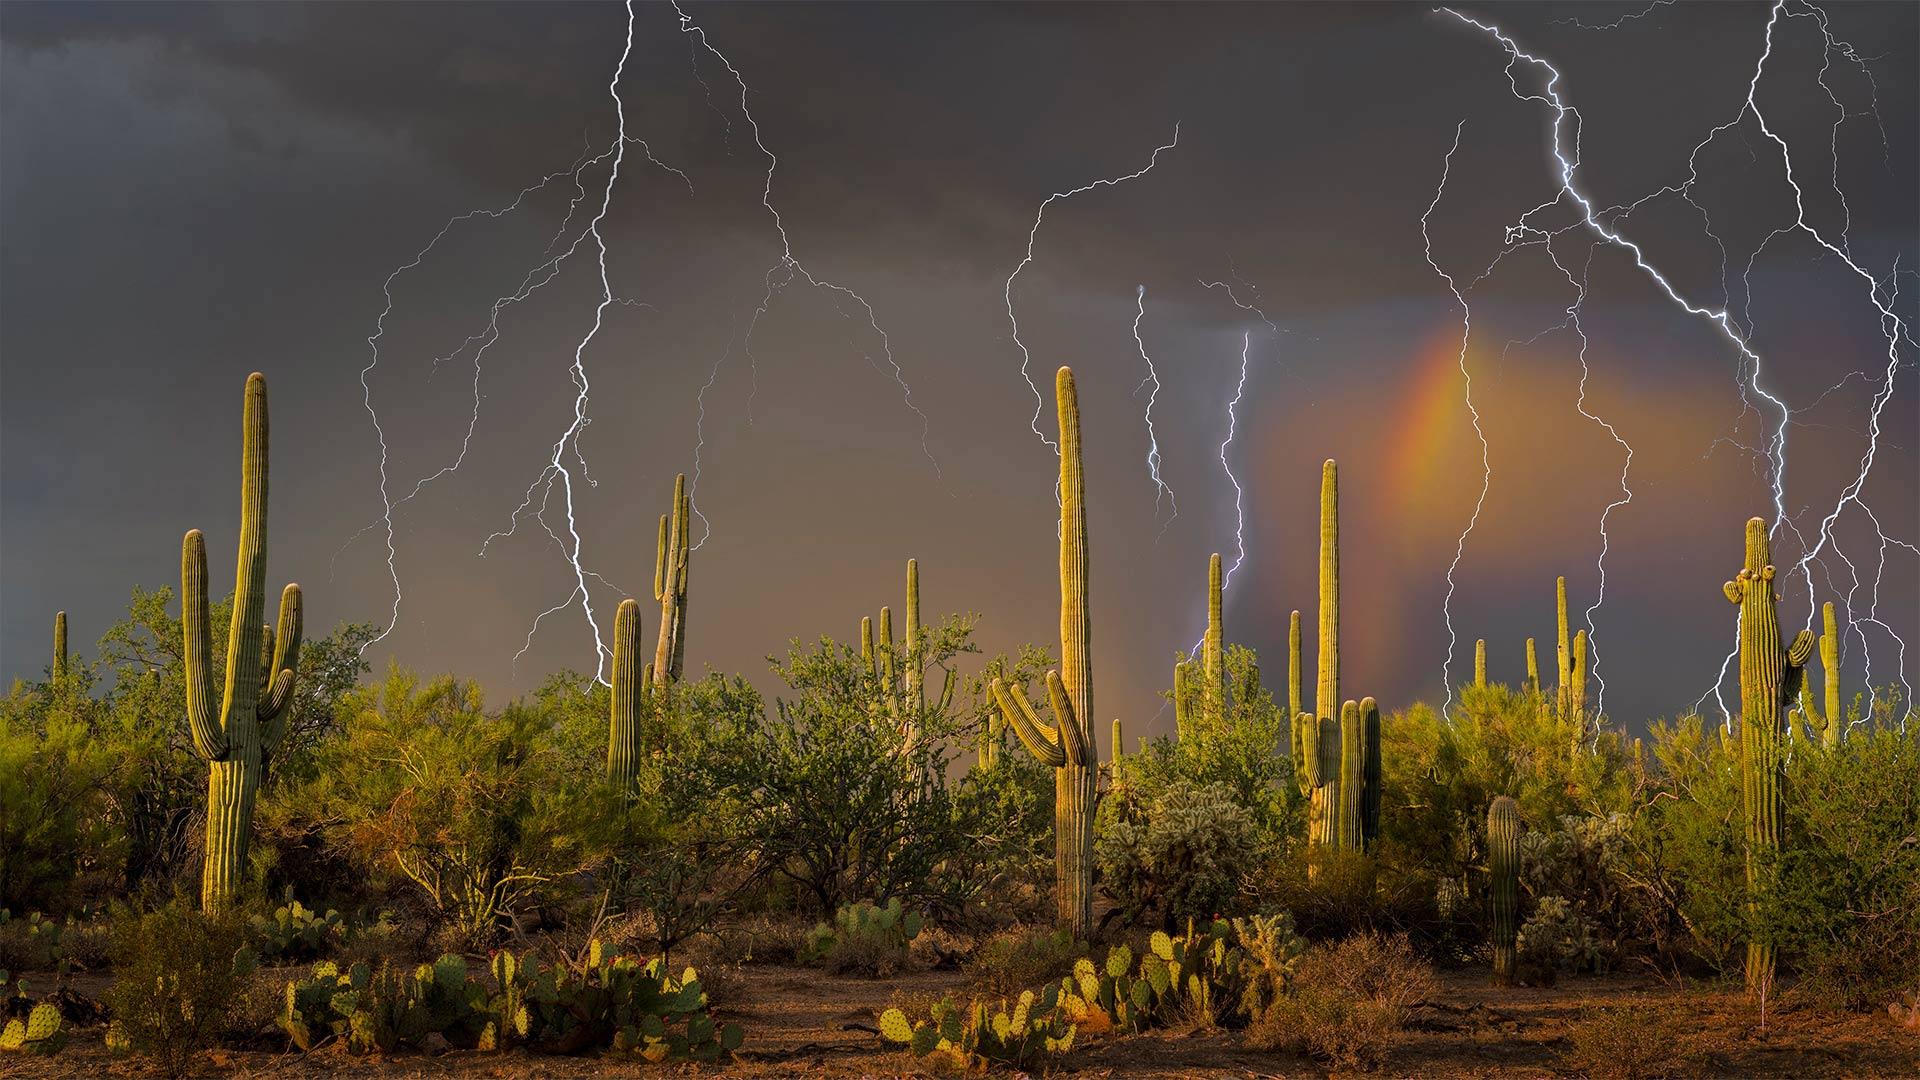 Lightning storm in the Tortolita Mountain foothills, north of Tucson, Arizona, in the Sonoran Desert (© Jack Dykinga/Minden Pictures)(Bing United States)